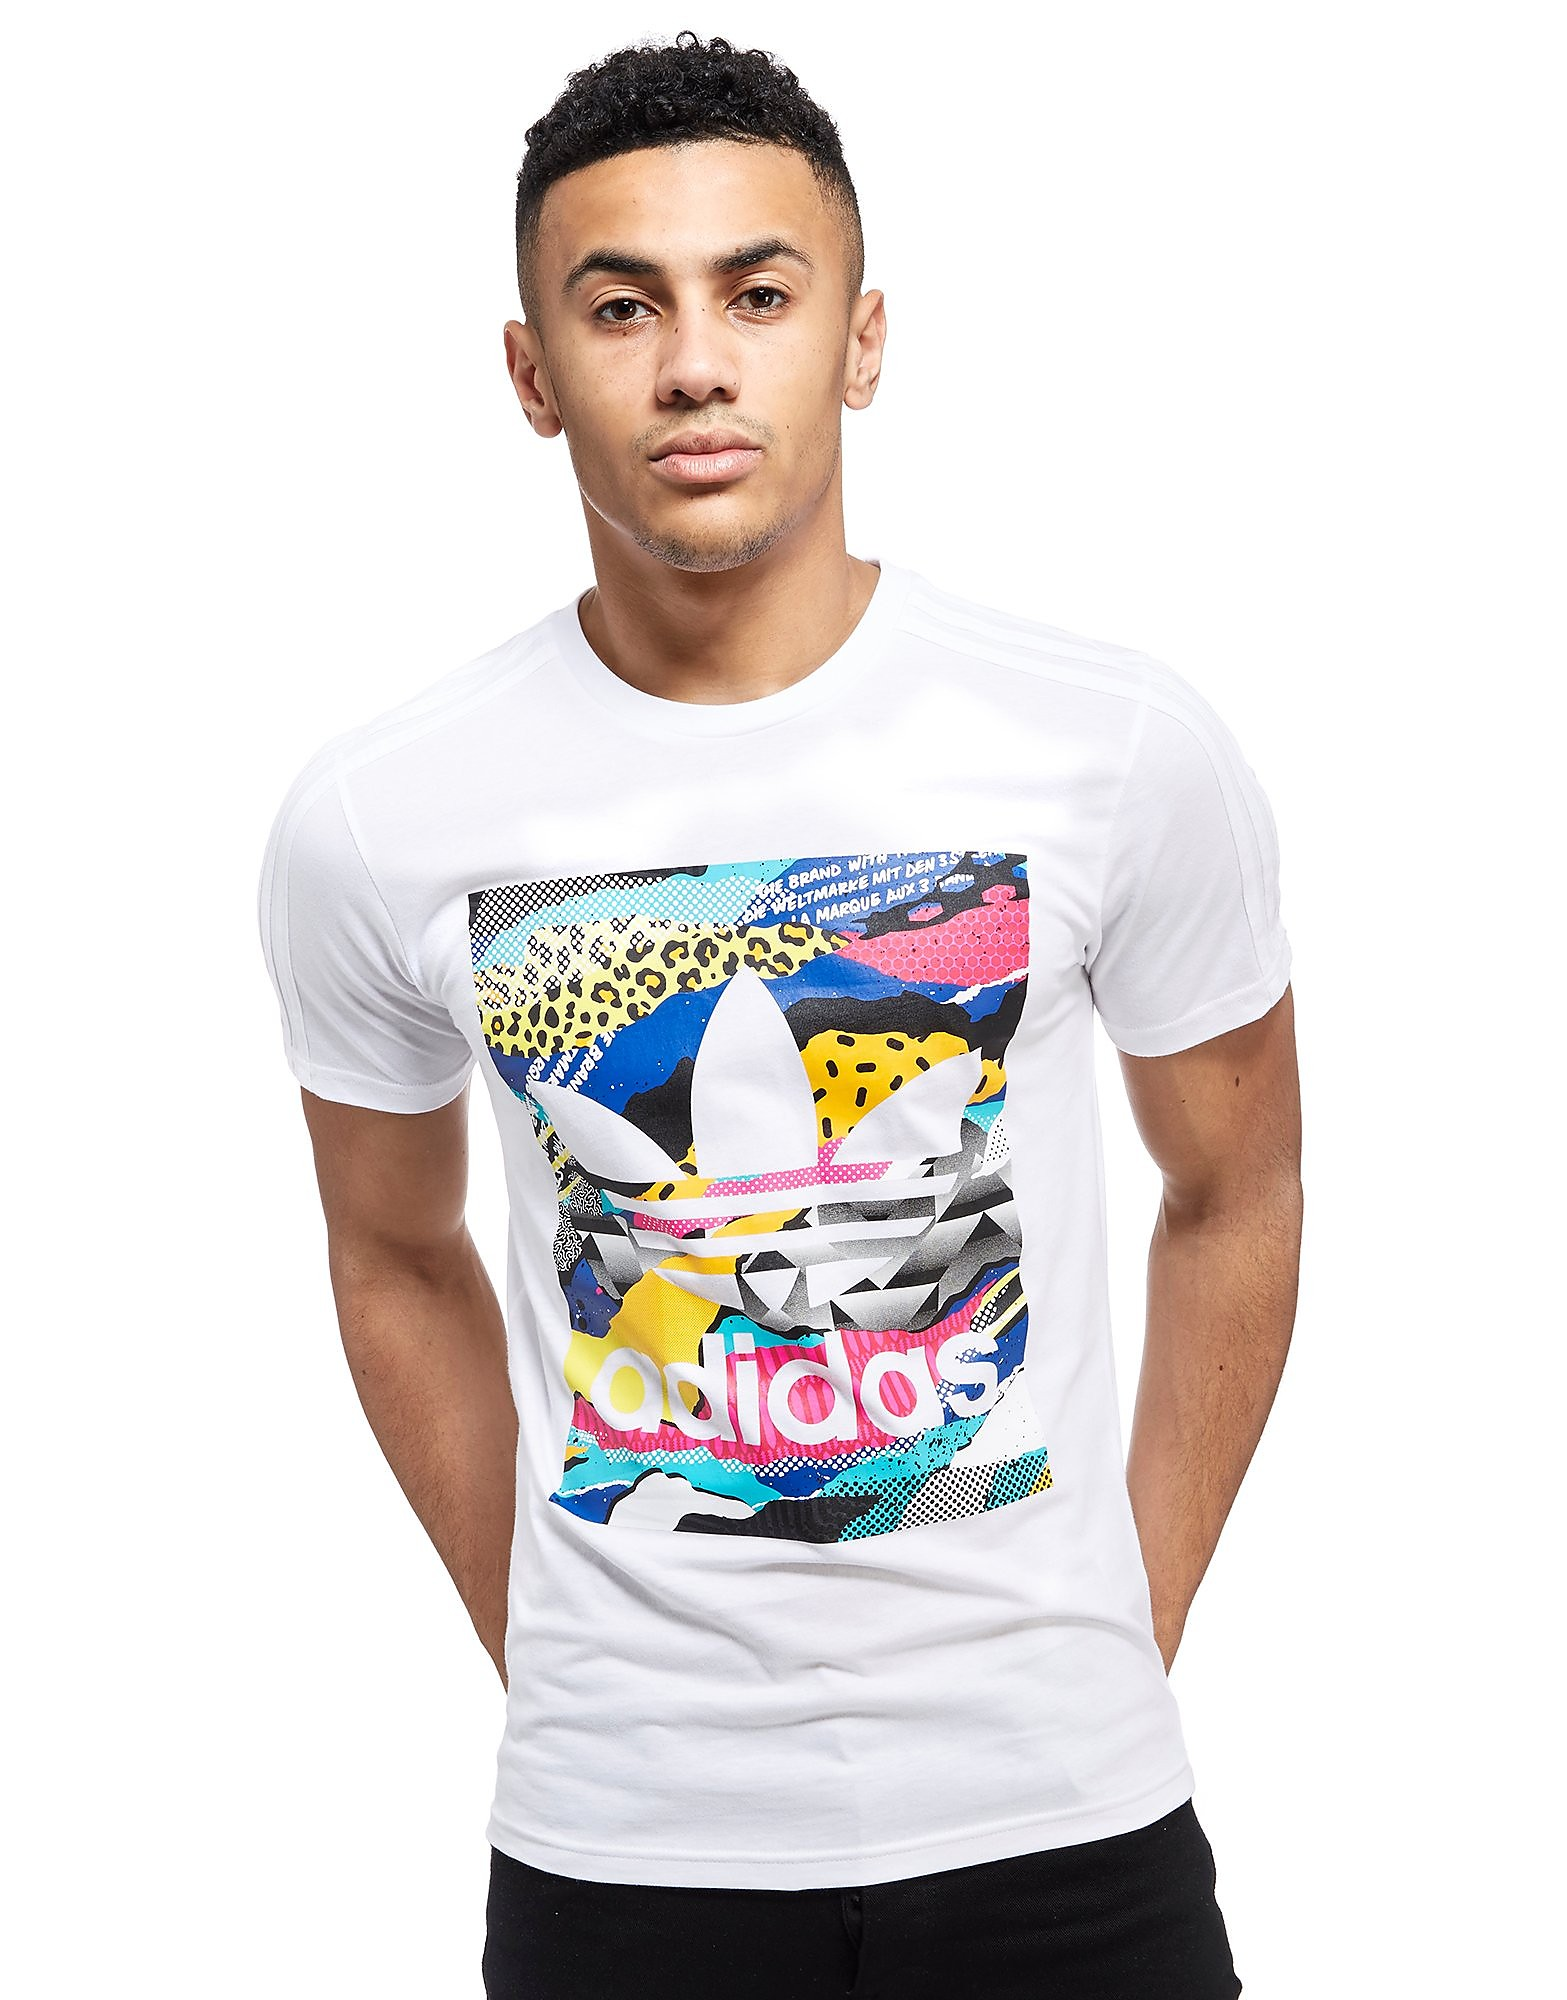 adidas Originals Los Angeles T-Shirt